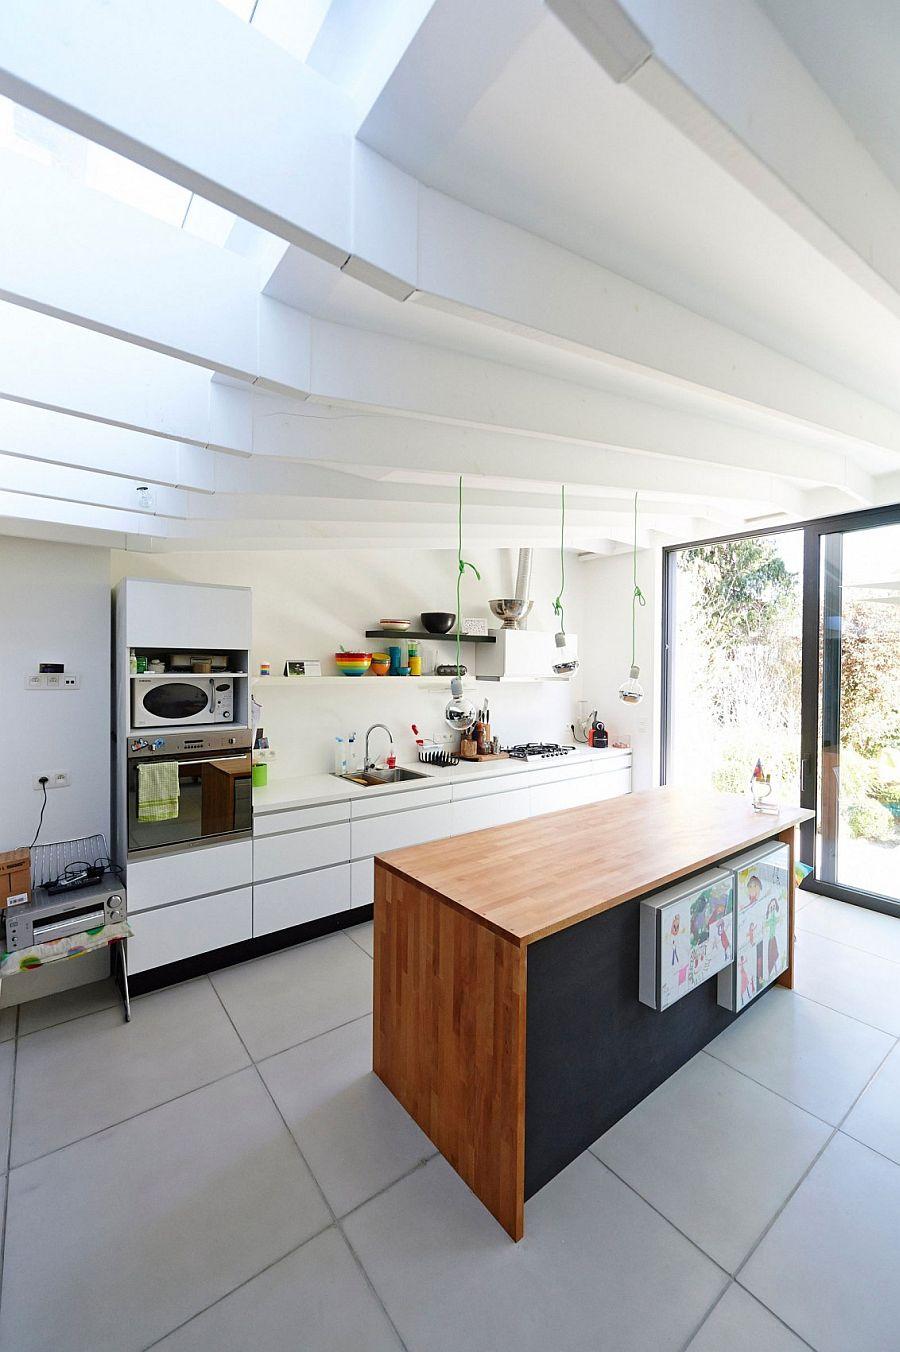 View In Gallery Sleek Kitchen Workstation In White And Wooden Island